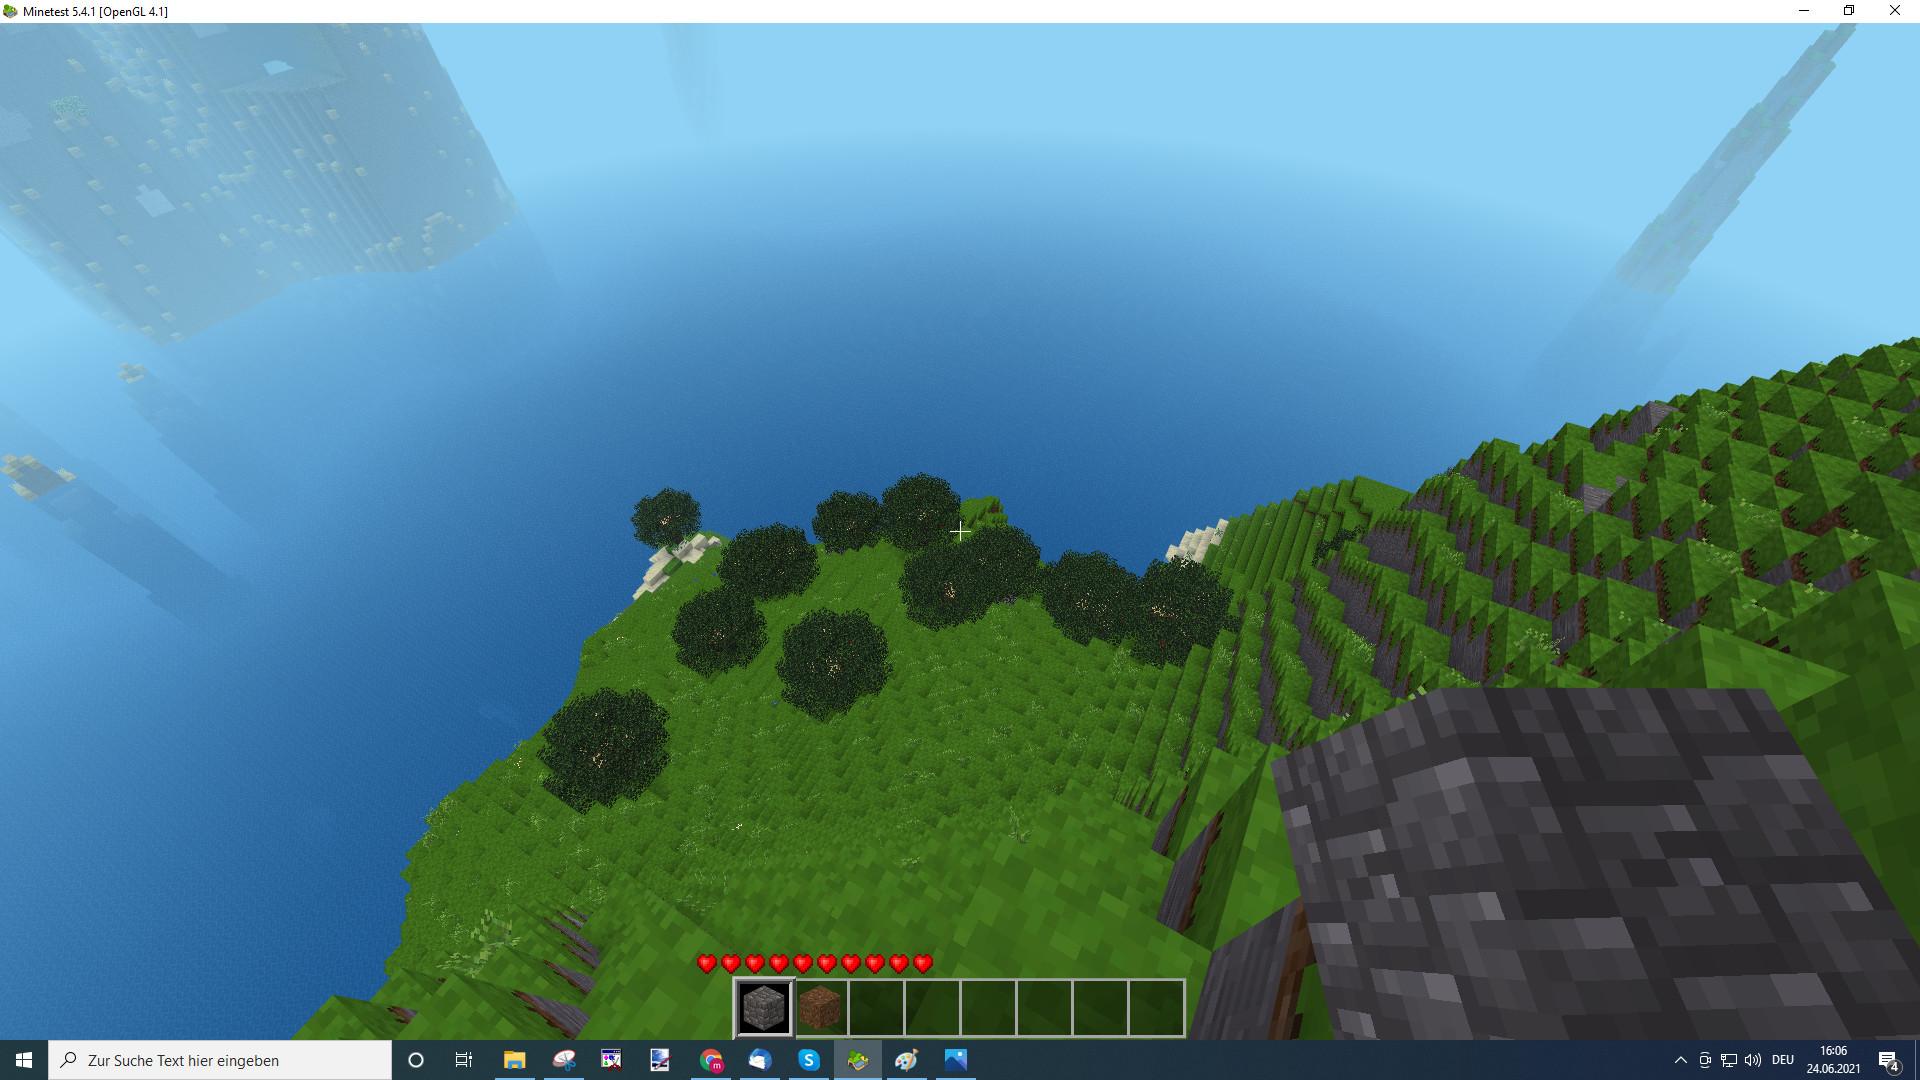 Screenshot 1 - Minetest